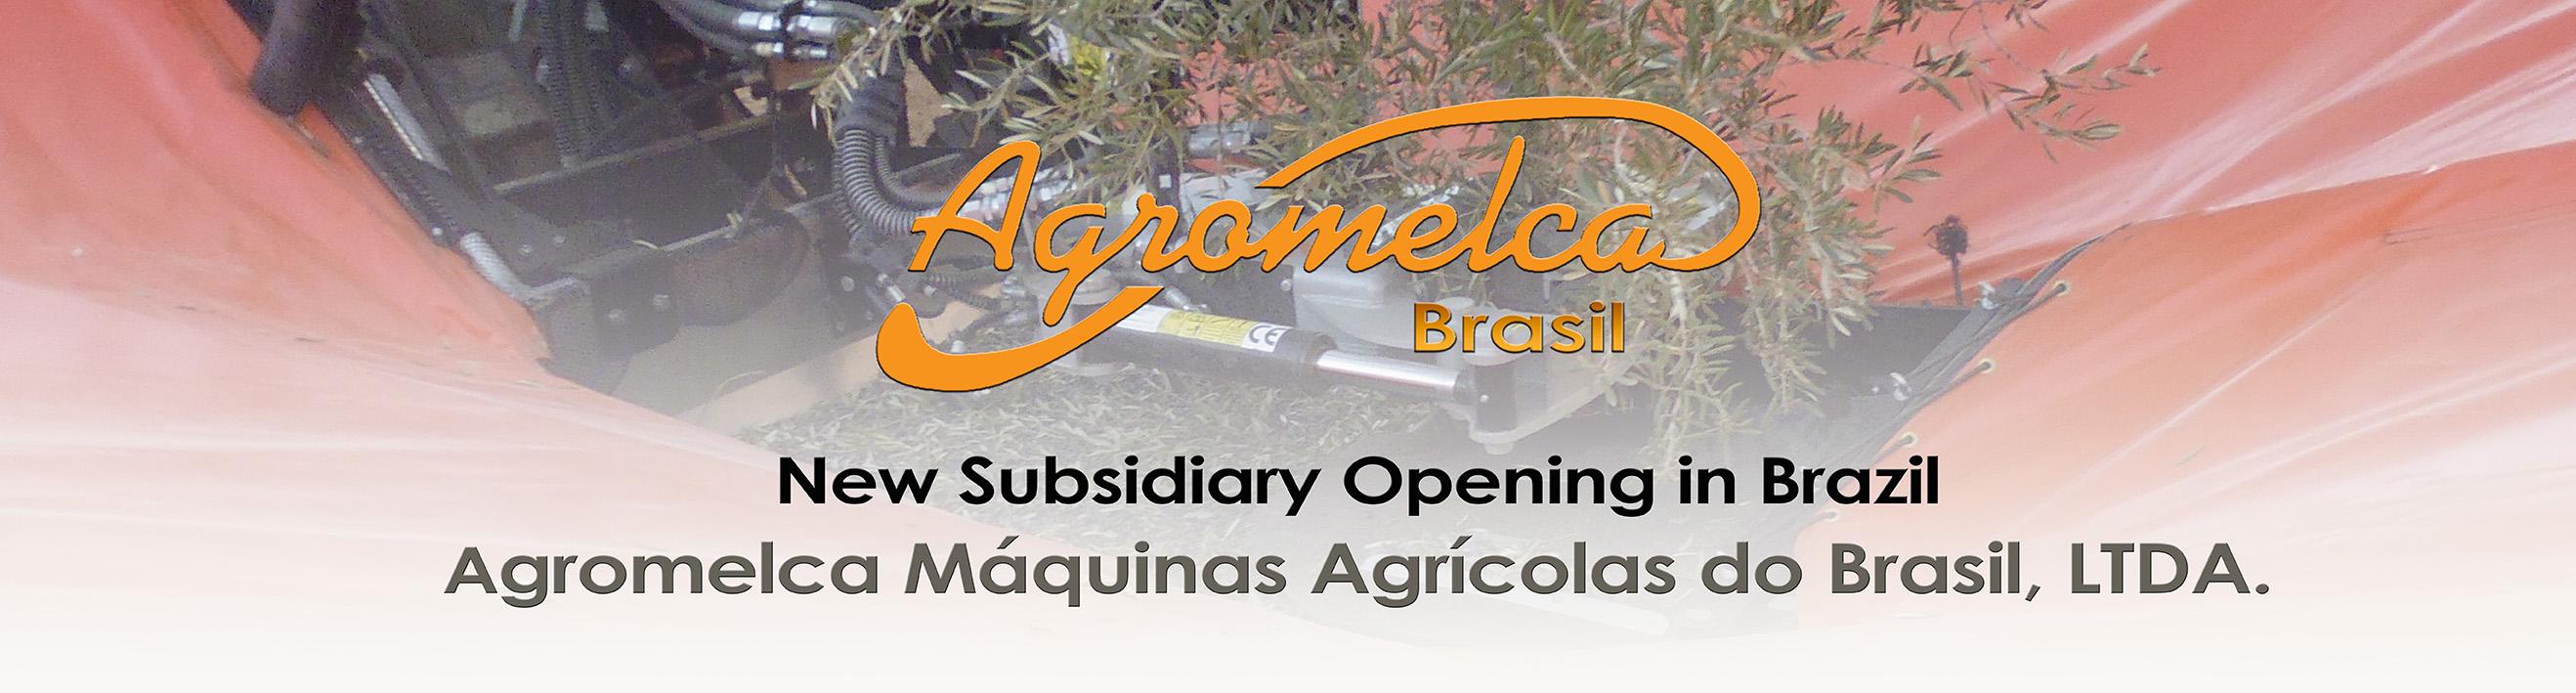 equipos_recolectores_de_aceituna_y_frutos_secos_agromelca_en_brasil_ingles-banner